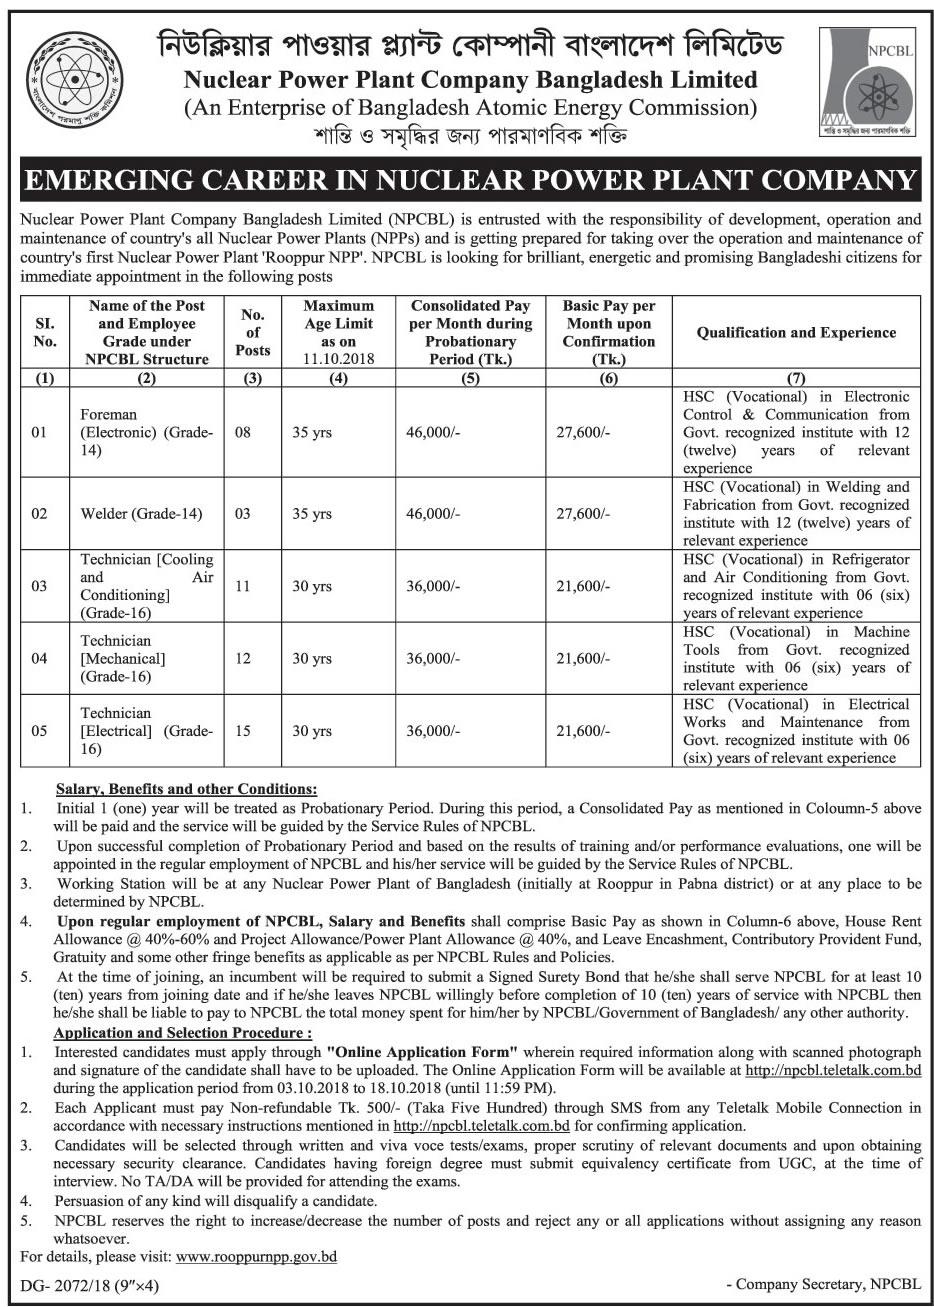 Nuclear Power Plant Company Bangladesh (NPCBL) Job Circular 2018